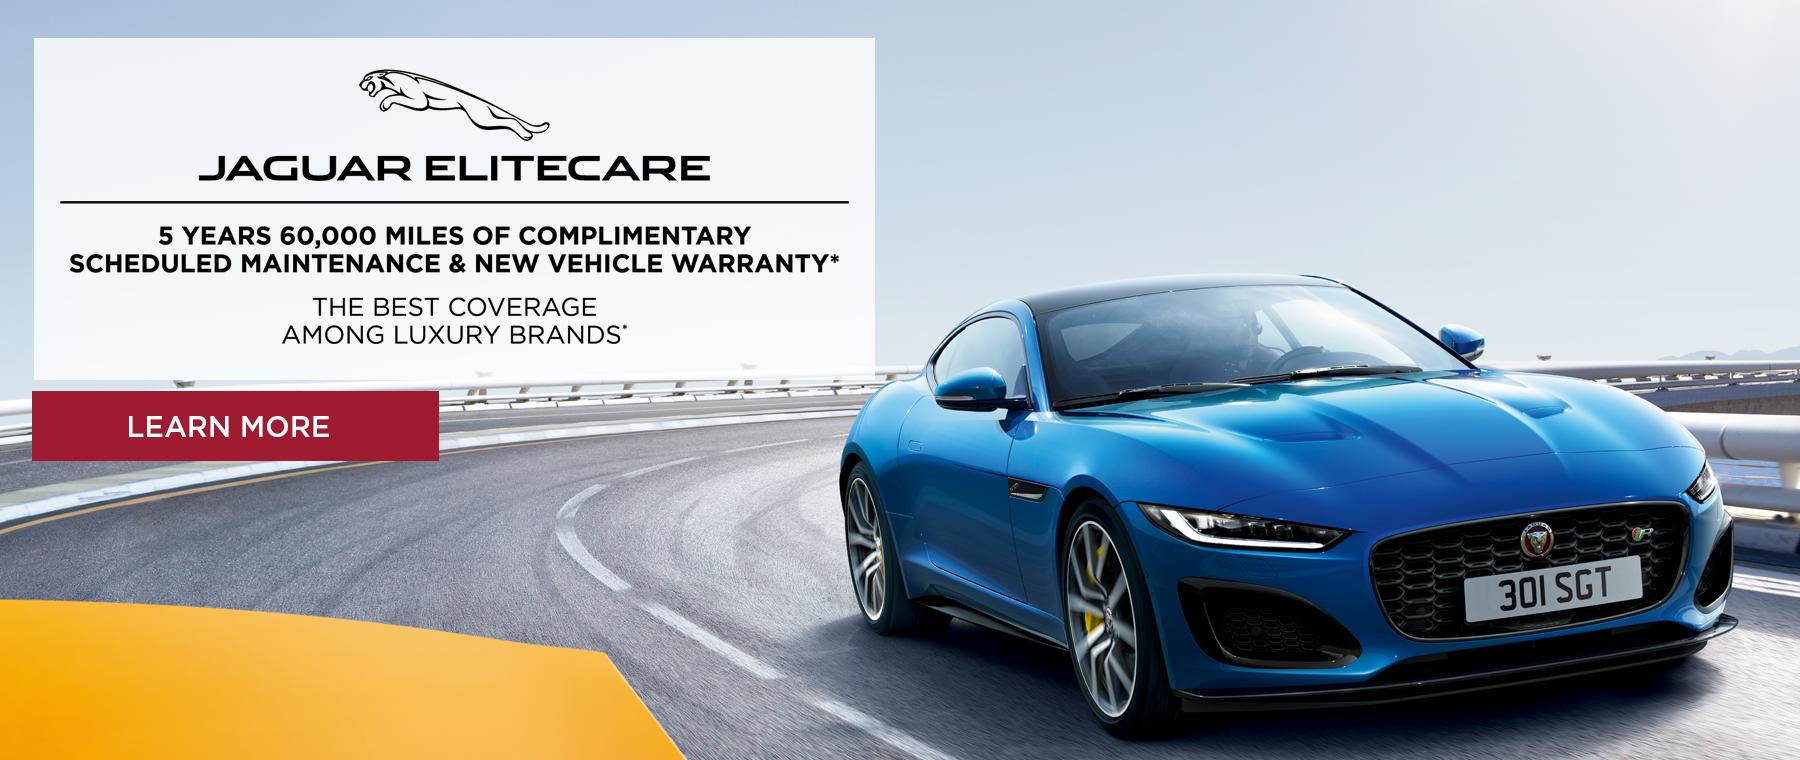 Jaguar Elitecare Advantage. Best coverage among luxury brands. Click to learn more.